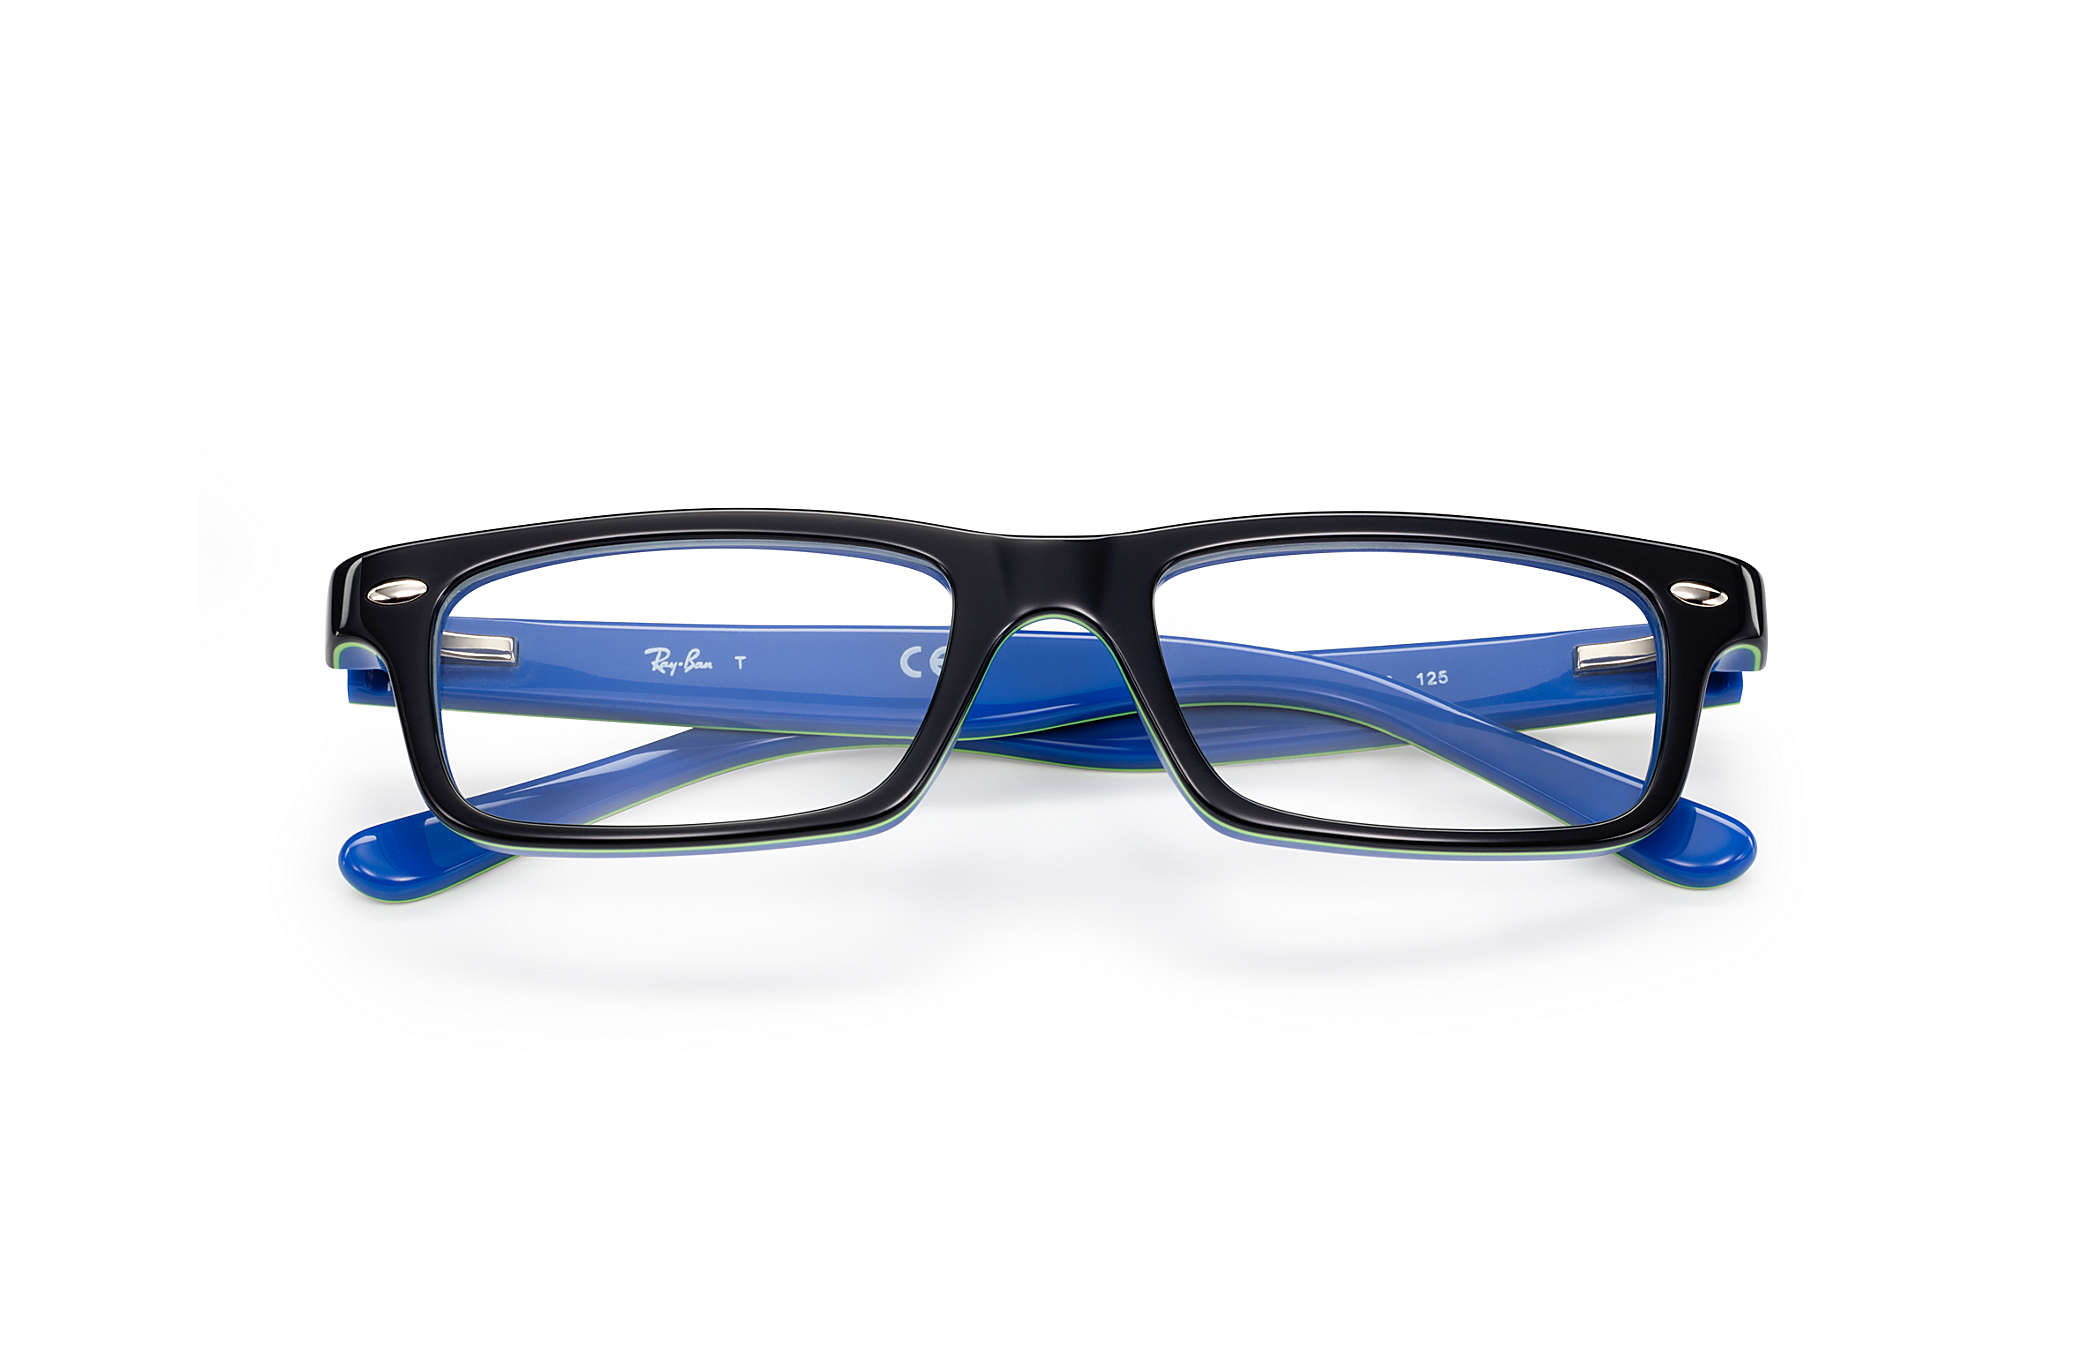 55fc2aaebb866 Ray-Ban eyeglasses RY1535 Grey - Acetate - 0RY1535360048